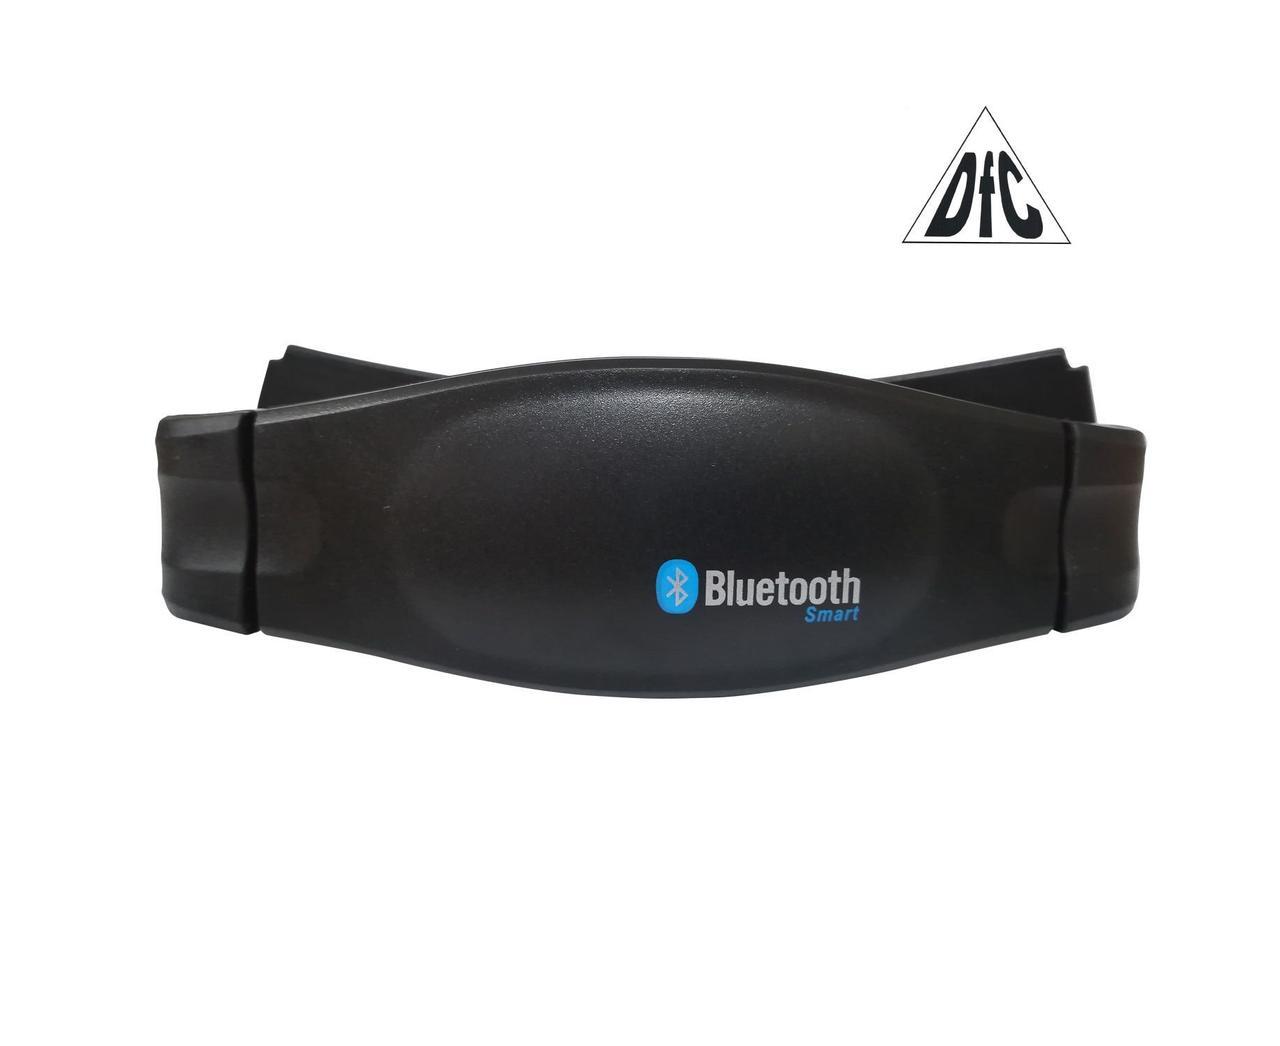 Нагрудный кардиопояс DFC W227Q (5кГц + Bluetooth) - фото 2